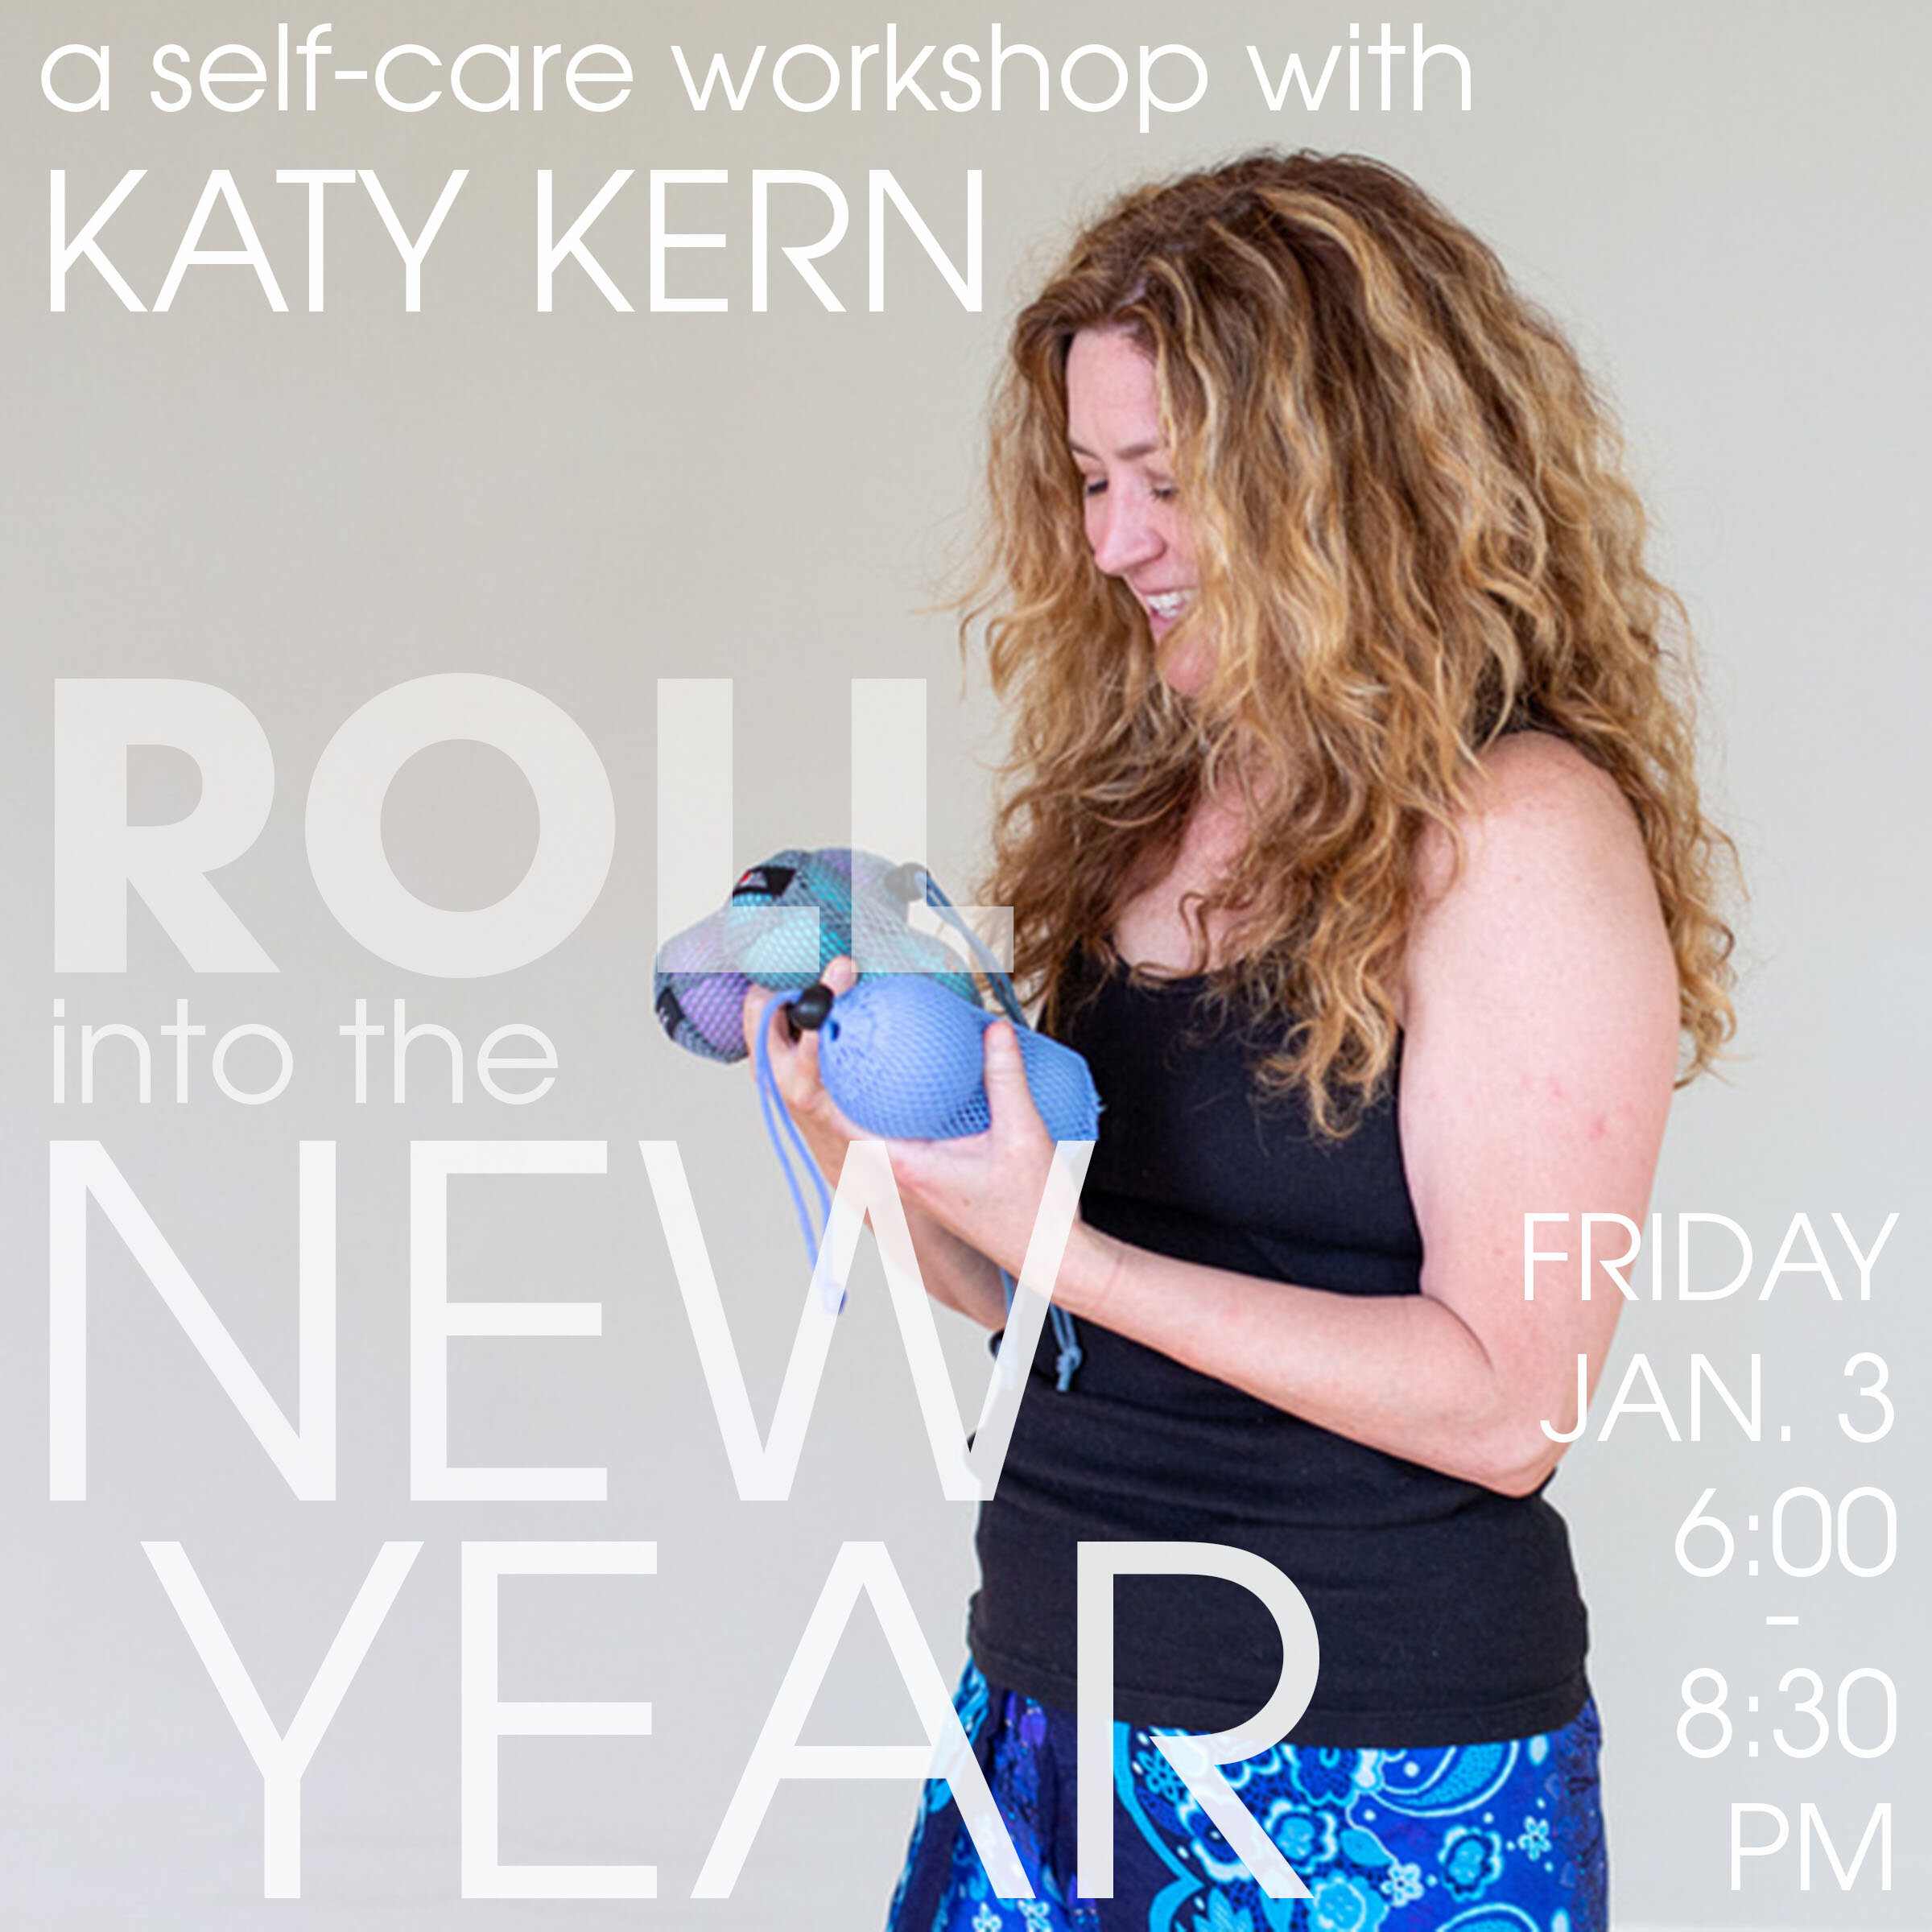 2019 Katy Kern Roll Into New Year Flat.jpg